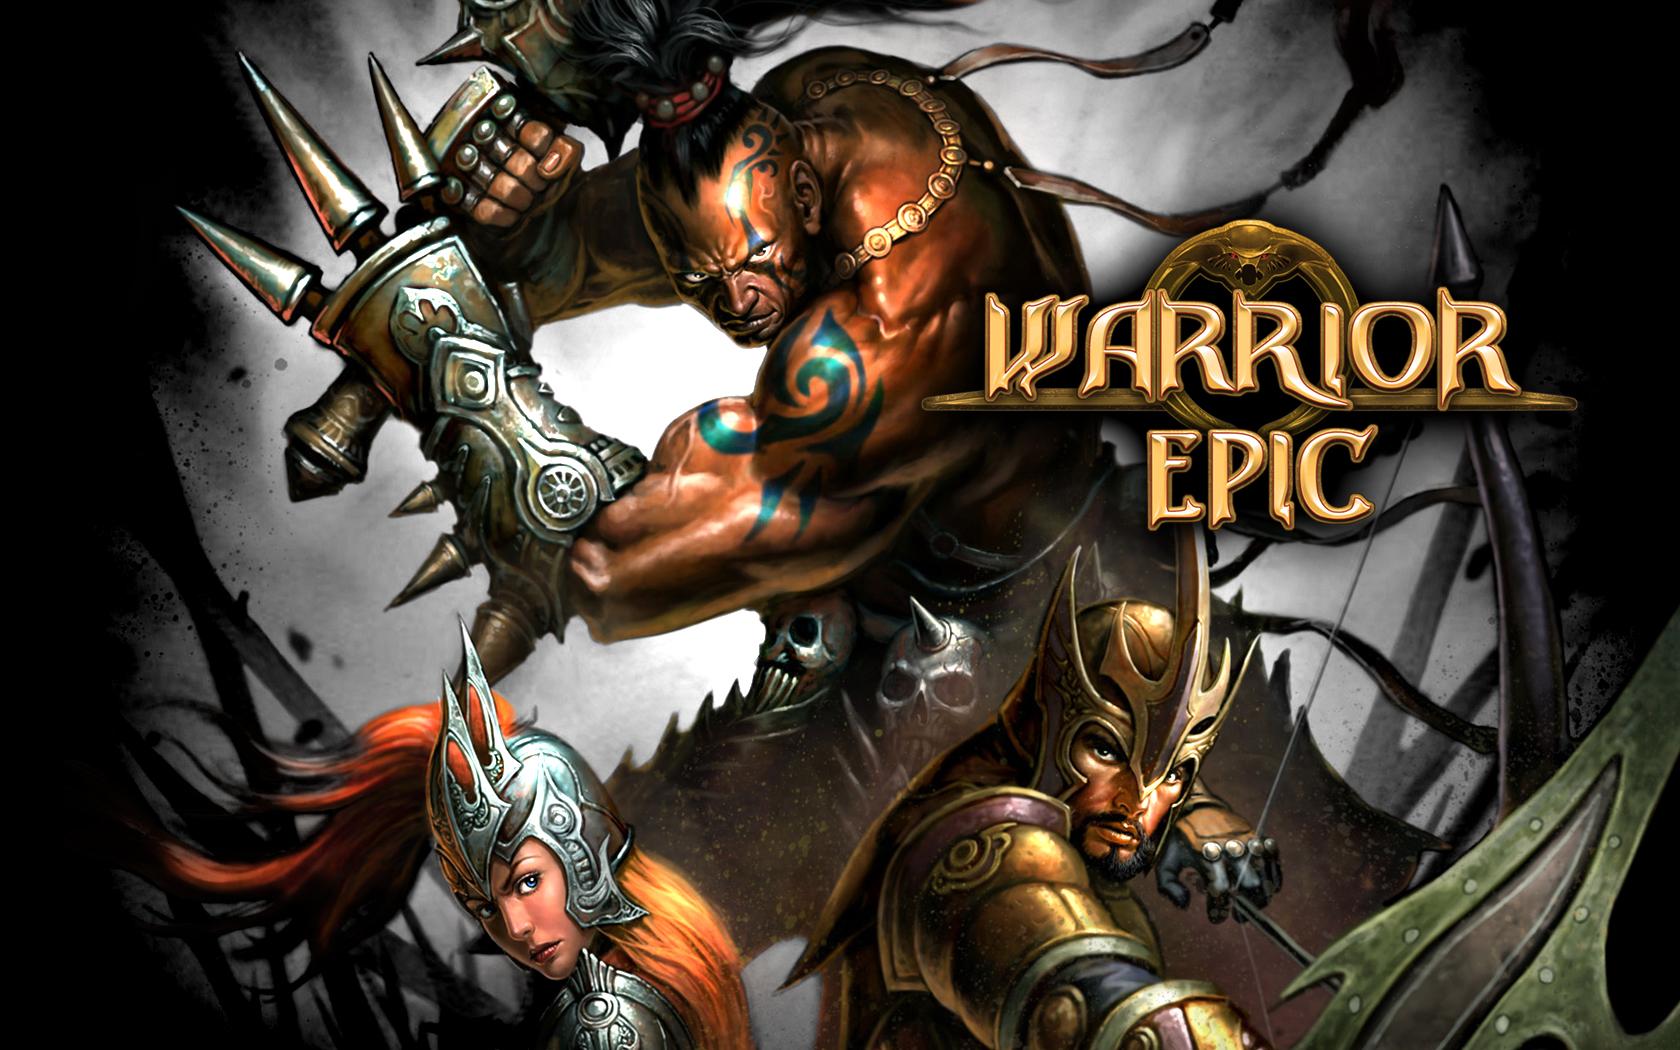 3d幻想网游《warrior epic》壁纸下载